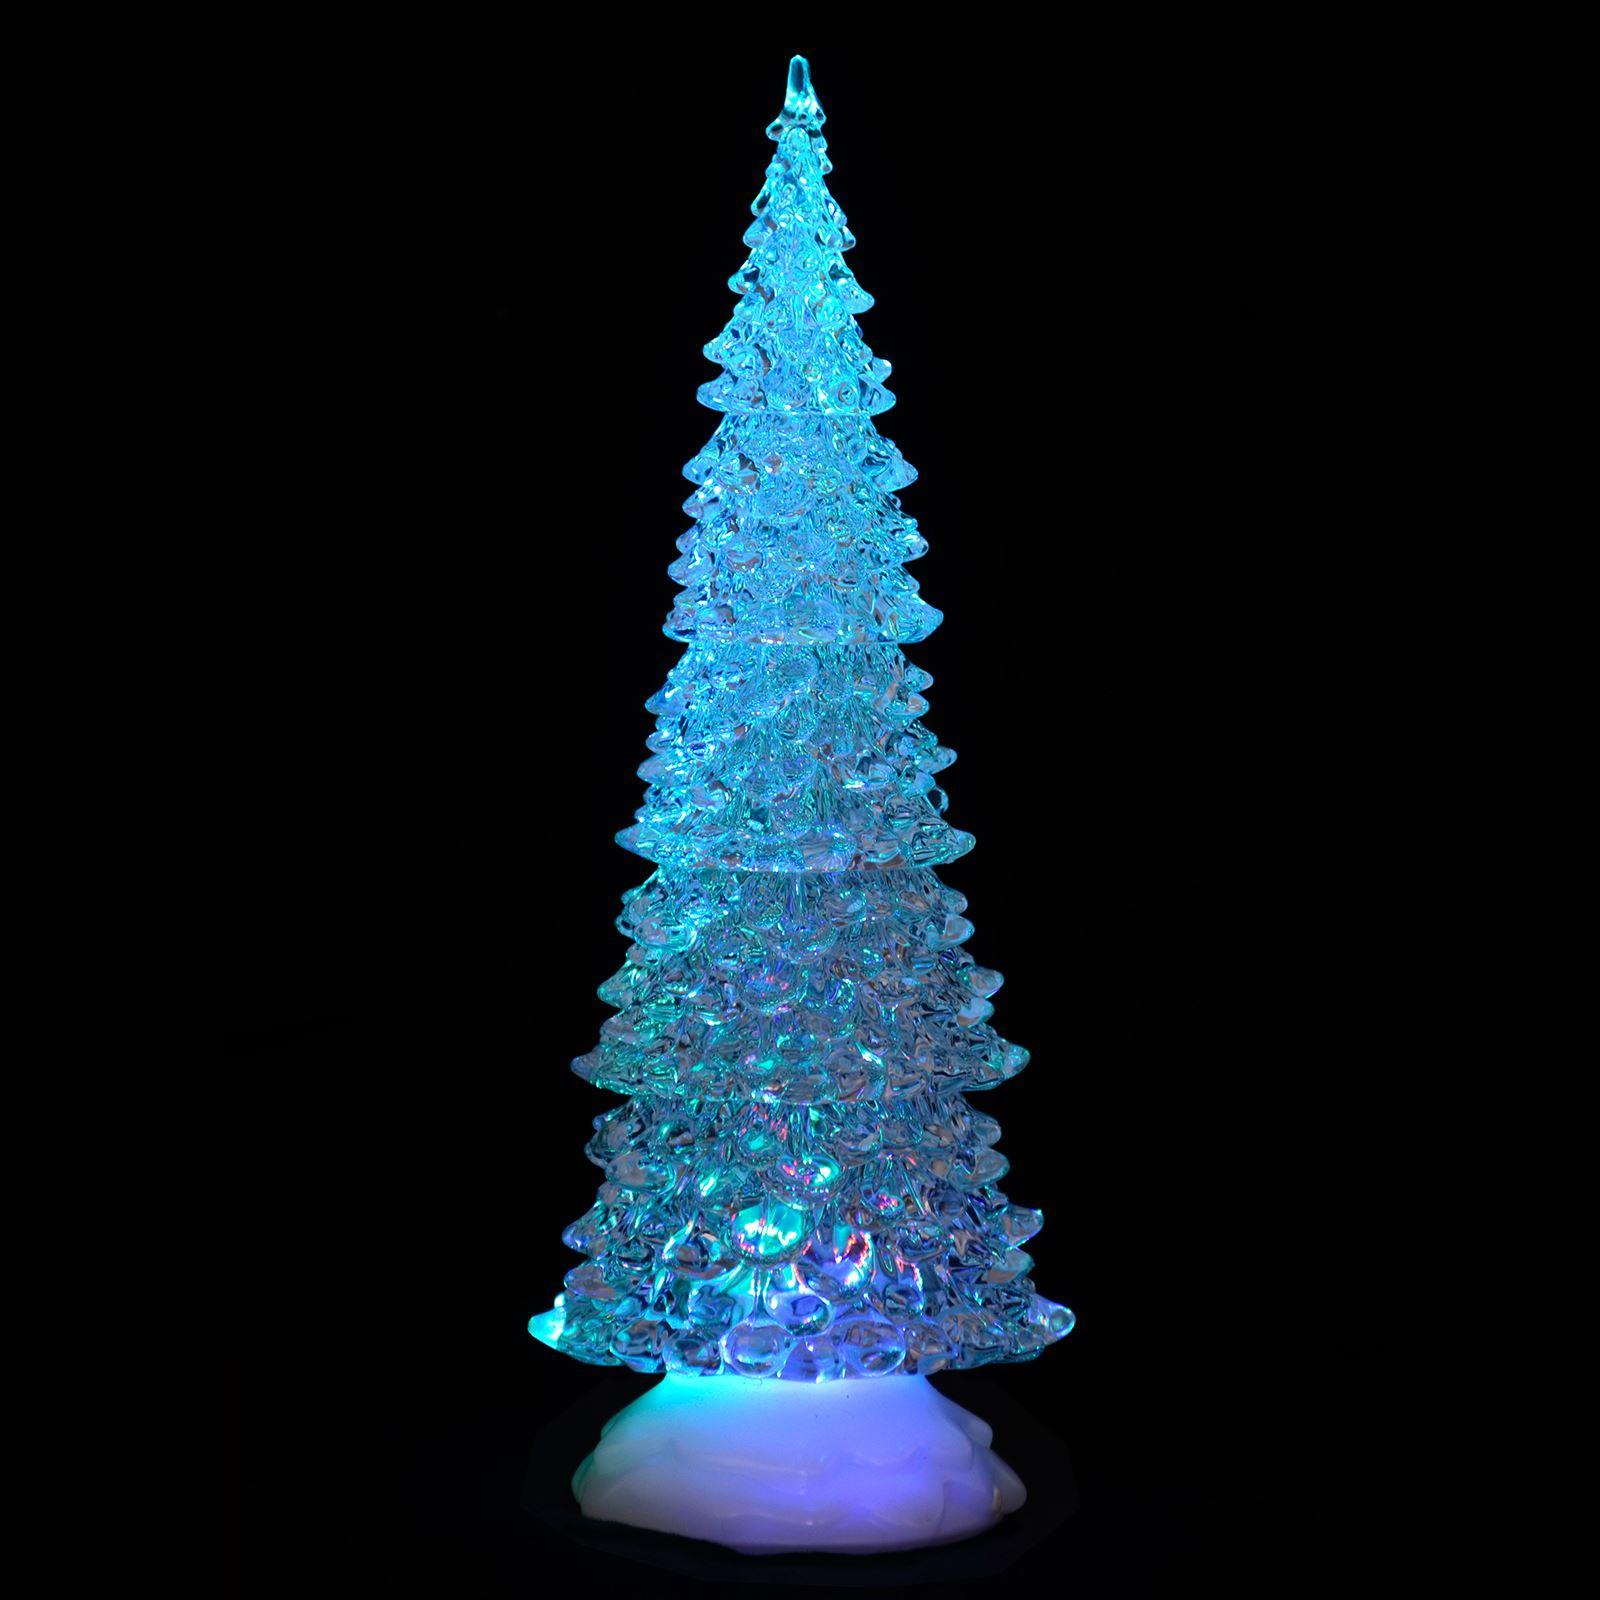 Light Up Acrylic Xmas Tree Ornament Christmas Decoration Colour Changing